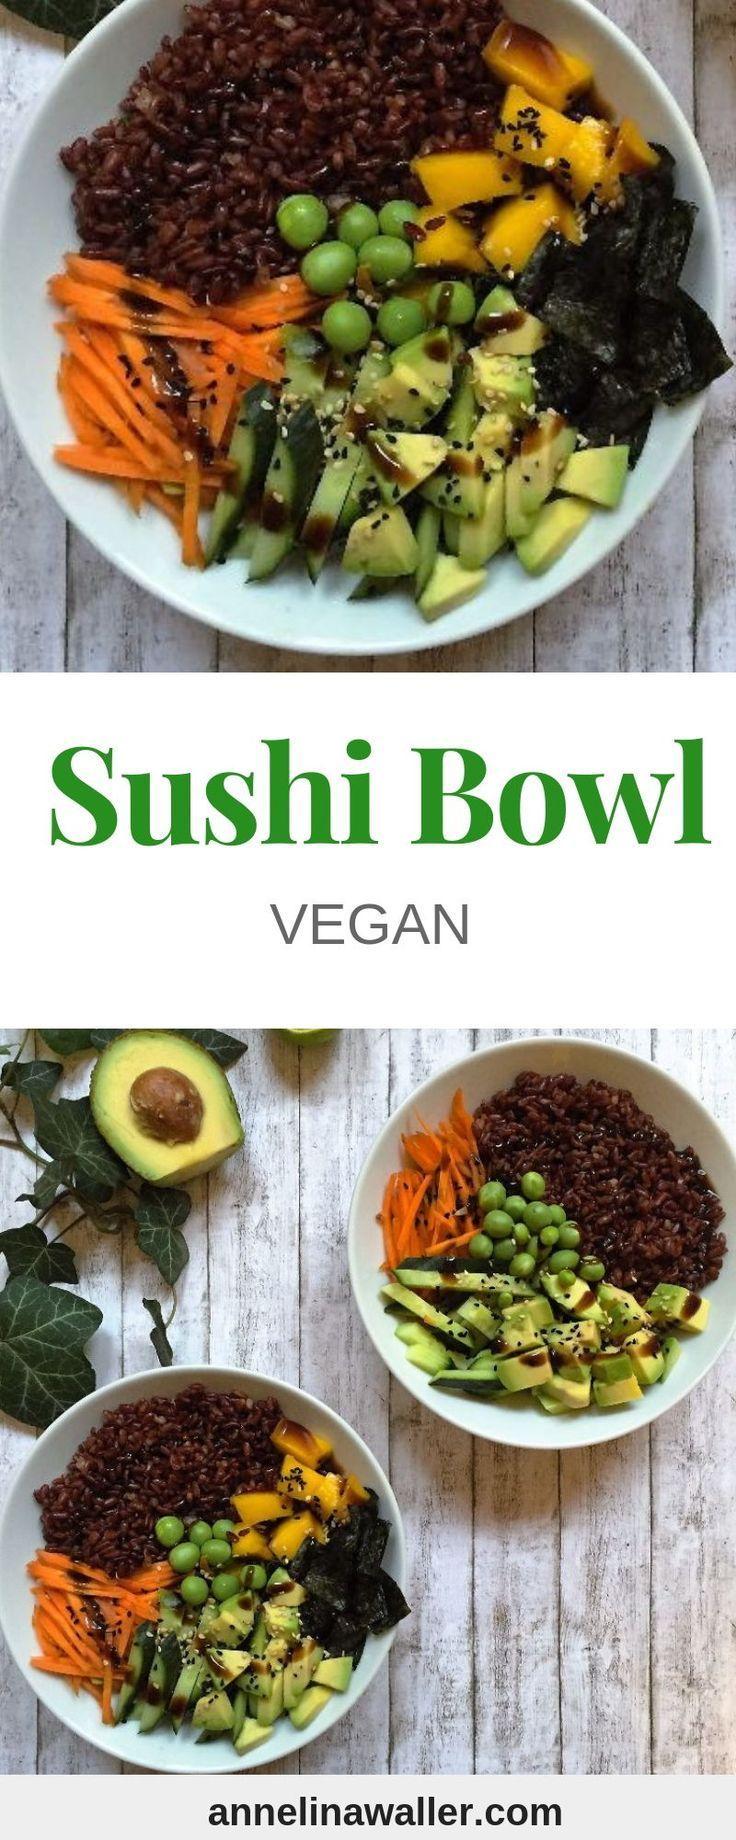 Sushi, sushi bowl, vegane rezepte deutsch, vegane rezepte Mittag, vegane rezepte schnell, vegane rezepte backen, vegane rezepte Abendessen, vegane rezepte gesund, gesundes essen, gesunde rezepte, vegane rezepte Attila Hildmann, vegane rezepte, vegane rezepte einfach, vegane rezepte abnehmen #vegetarischerezepteschnell